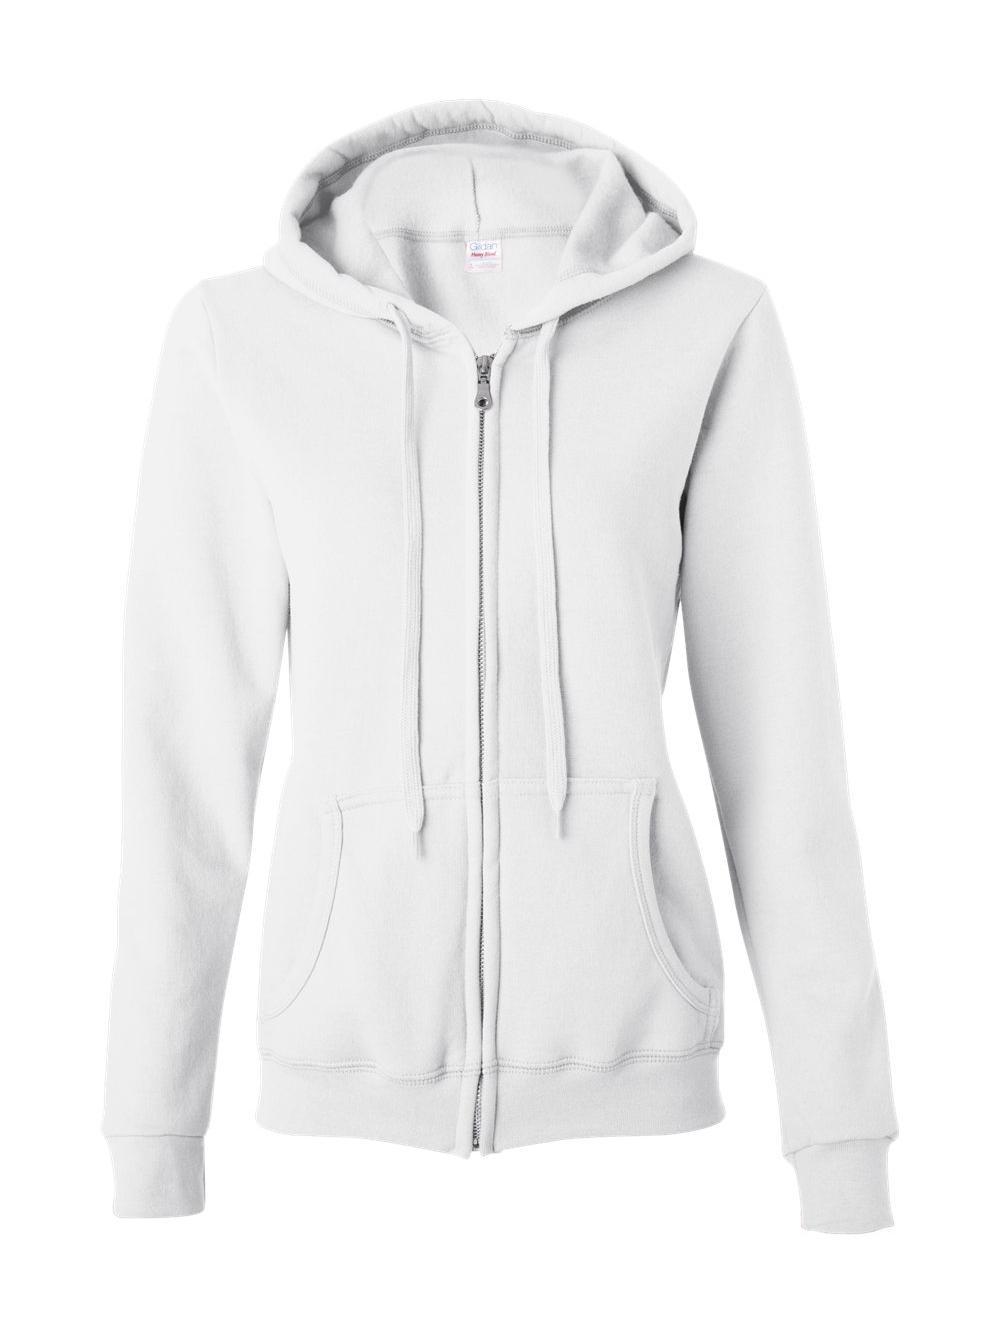 Gildan-Heavy-Blend-Women-039-s-Full-Zip-Hooded-Sweatshirt-18600FL thumbnail 15